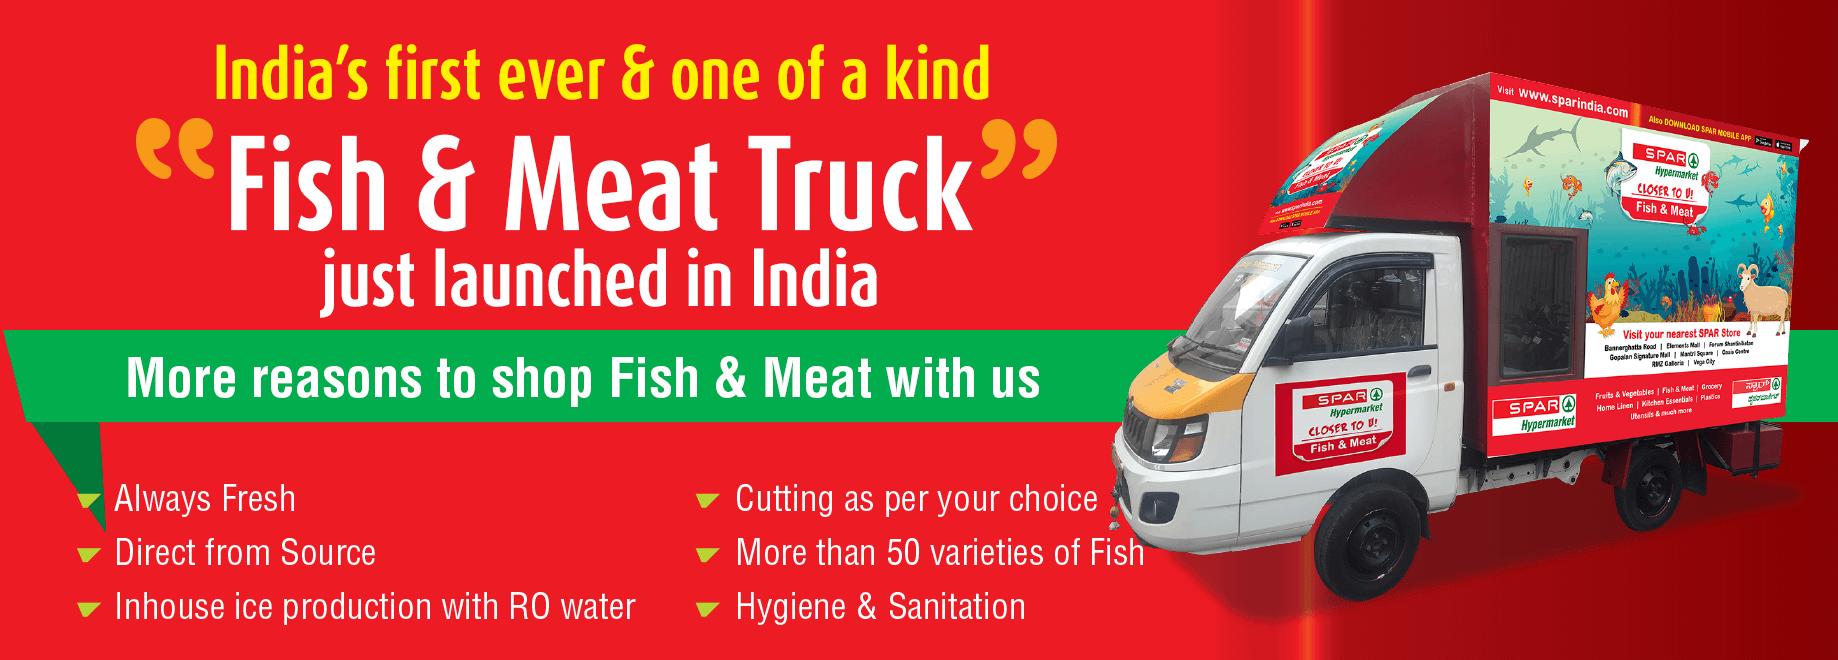 SPAR Hypermarket - Bangalore, Chennai, Hyderabad, Delhi NCR